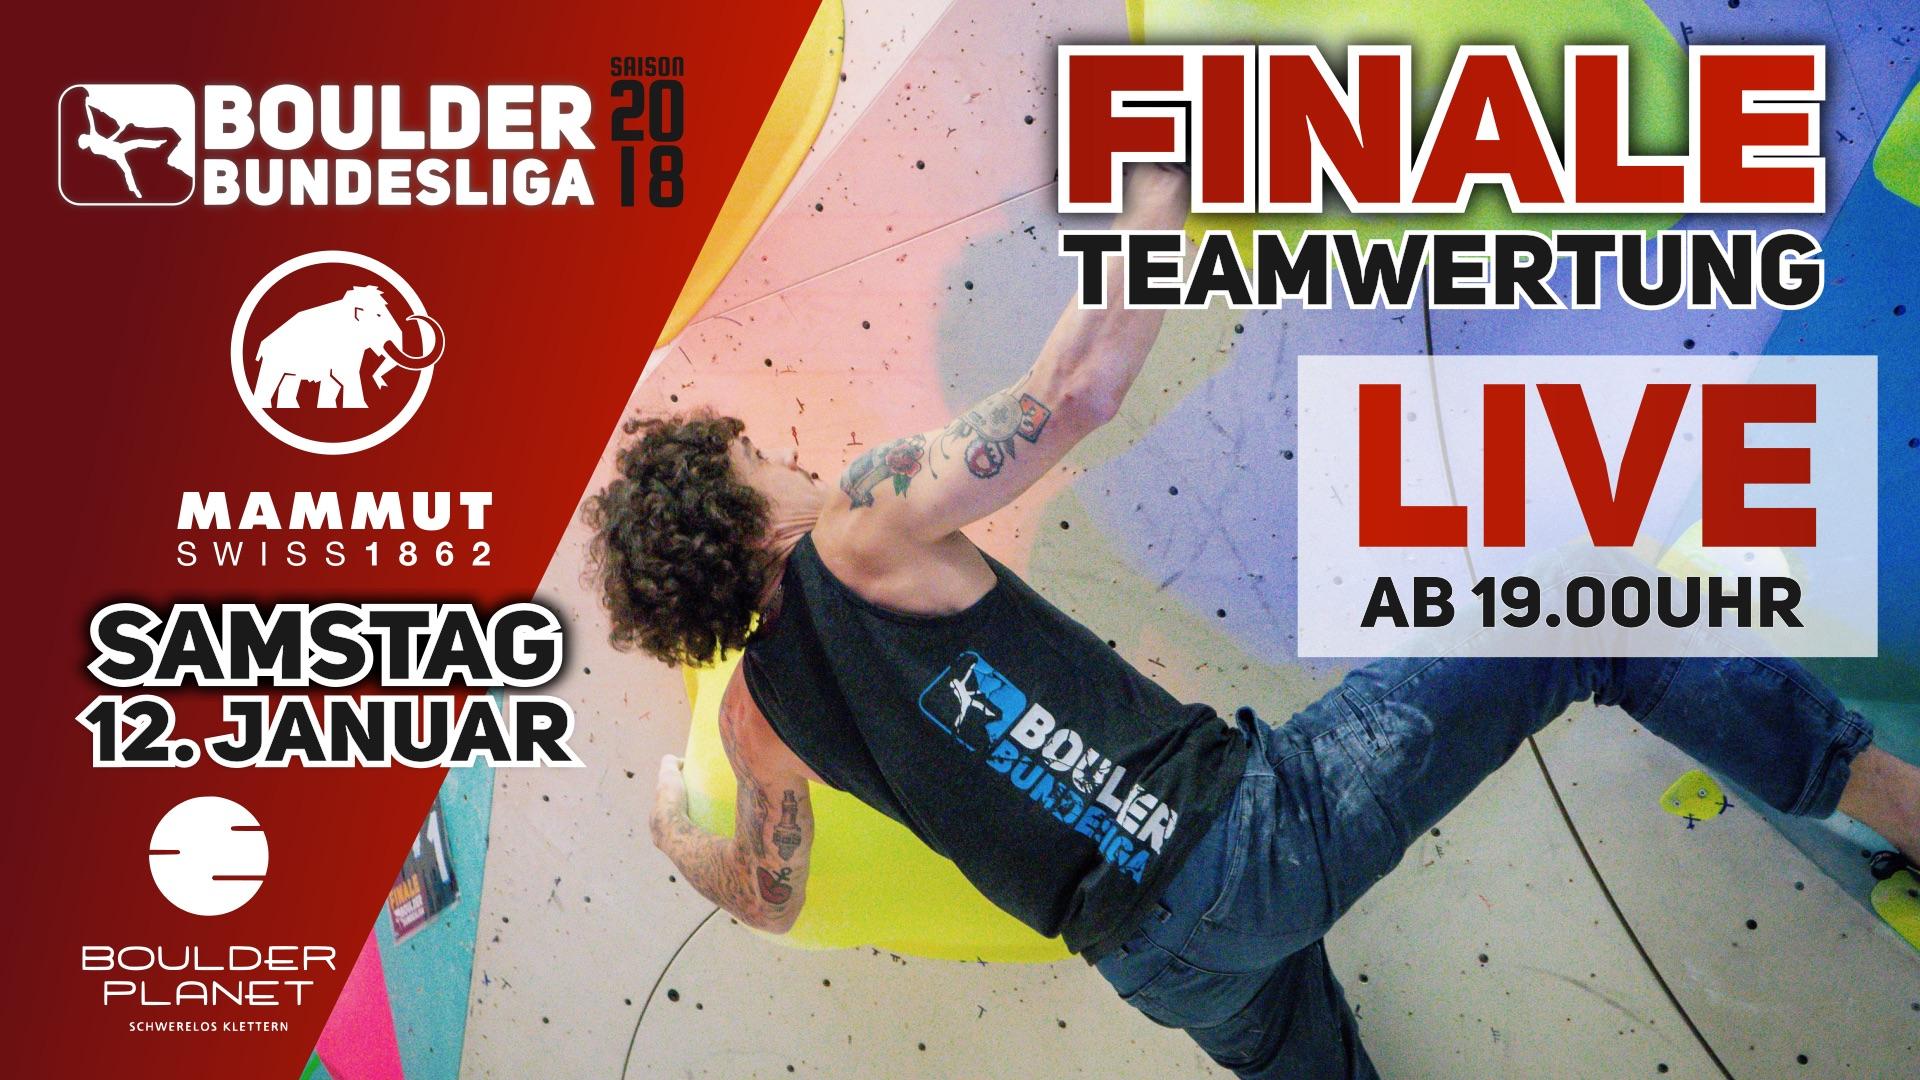 Livestream: Finale Teamwertung 2018